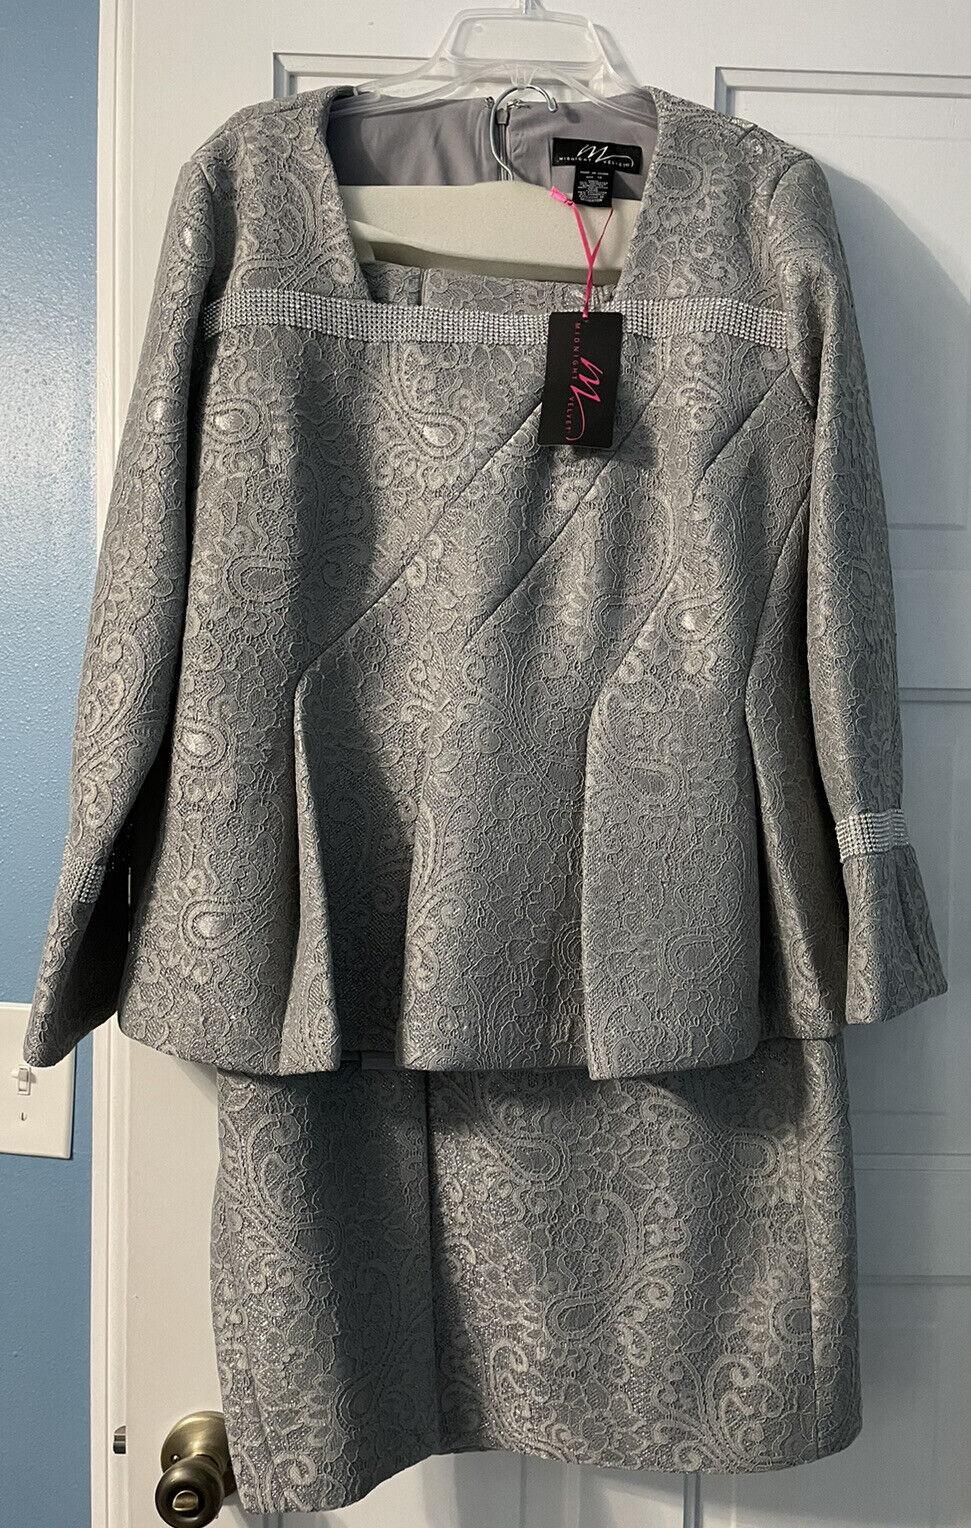 Midnight Velvet Elegant Jacket Dress W/ Skirt. Mother of the Bride Holiday Sz 16